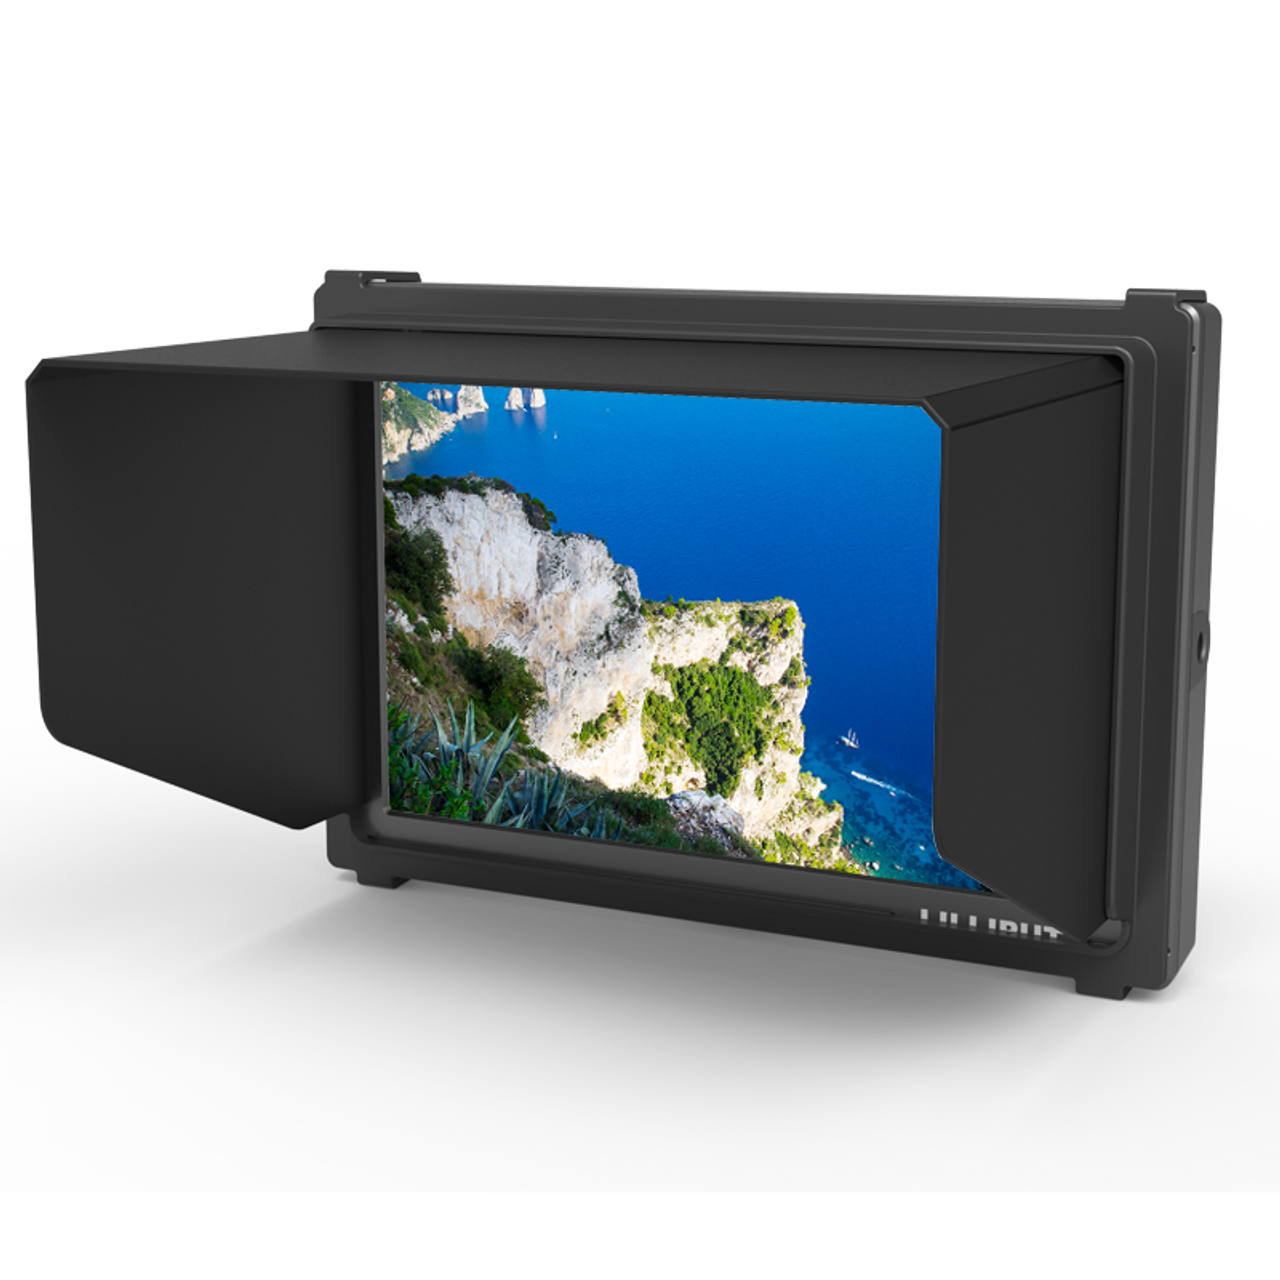 FS7- Full HD 7 Inch SDI Monitor With 4K HDMI Camera Assist